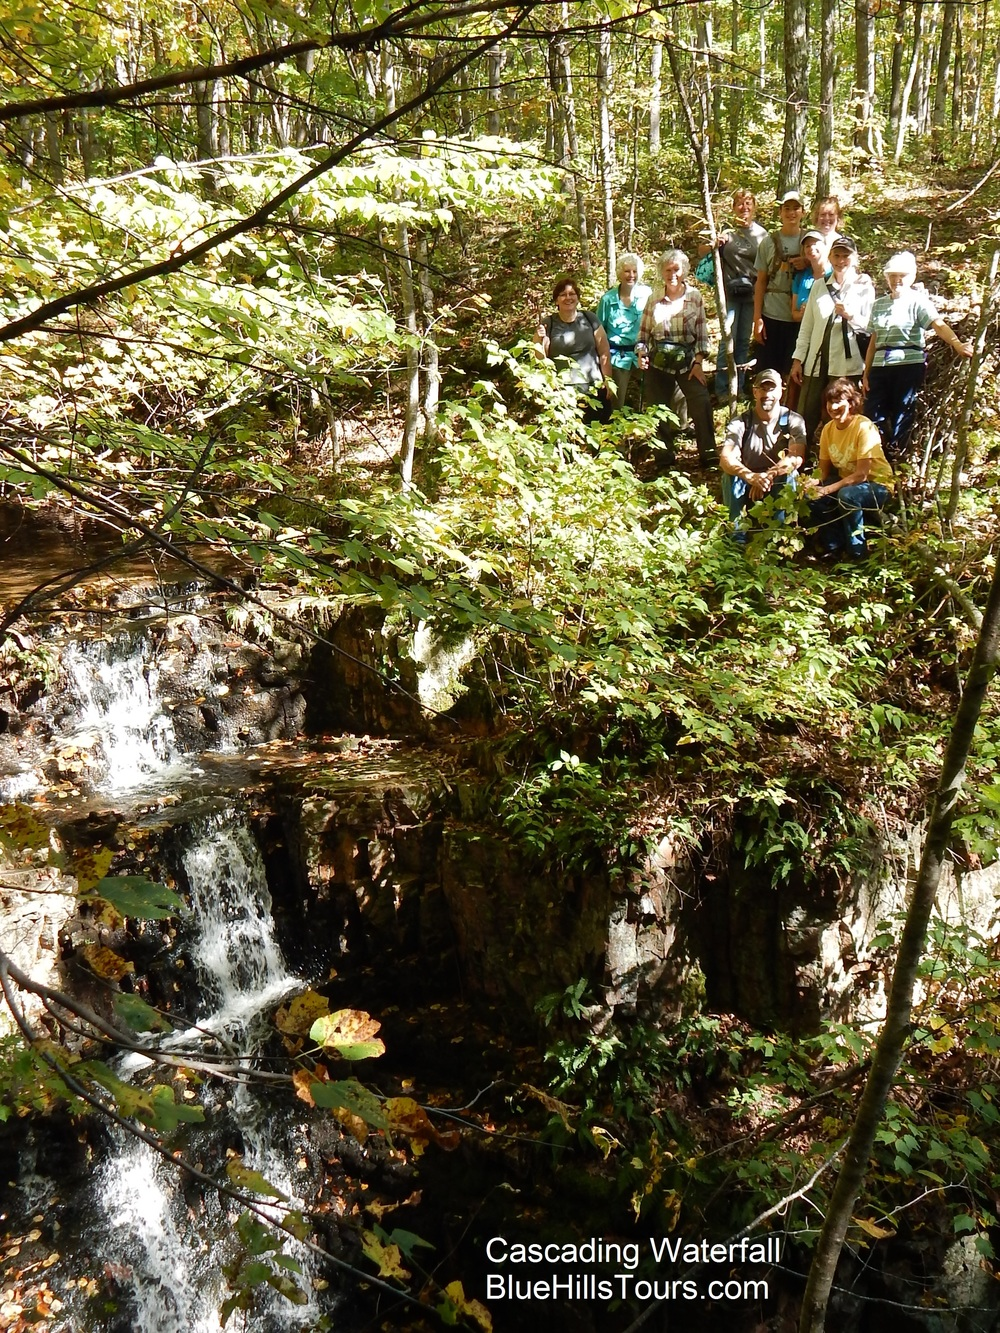 Group Cascading Waterfall Leaf it 2015.jpg